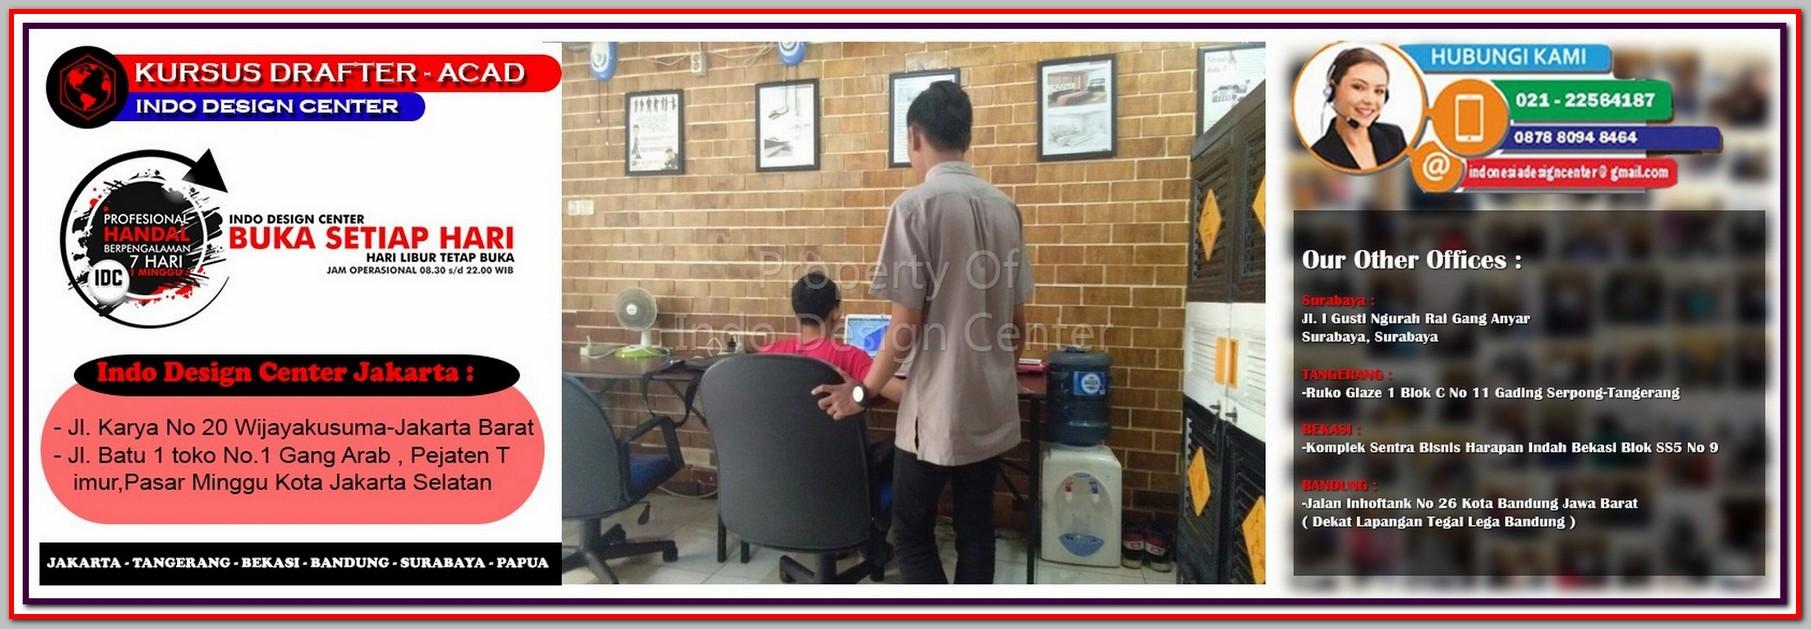 Kursus Perhitungan RAB Di Gondangdia - Jakarta - Tangerang - Bekasi - Bandung - Surabaya